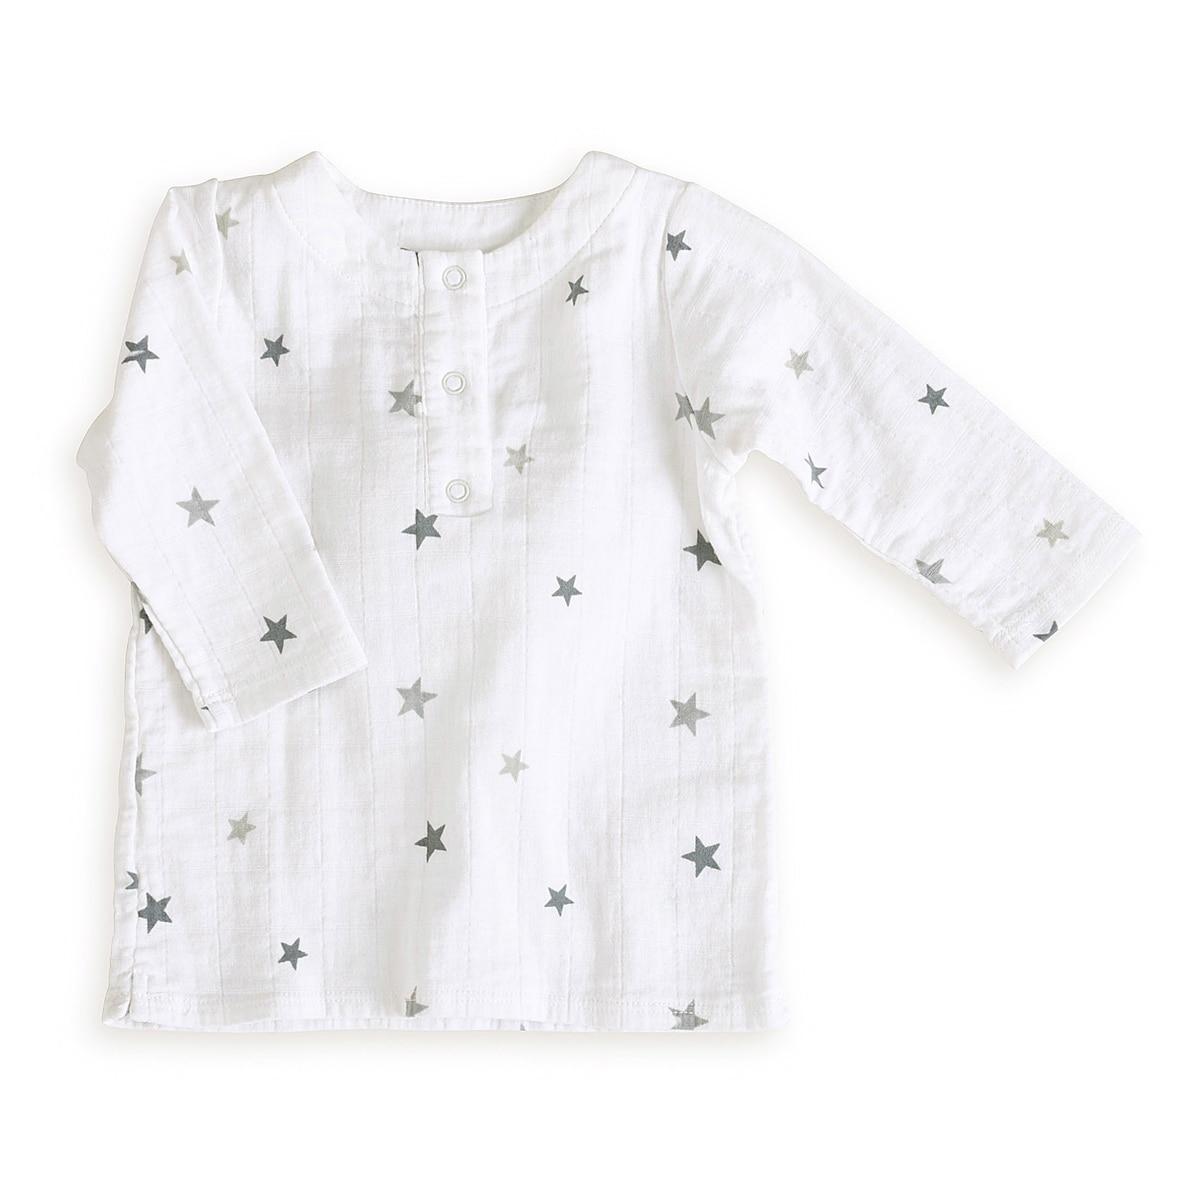 aden + anais Boys 0-3 Months Twinkle Tiny Star Muslin Tunic Top